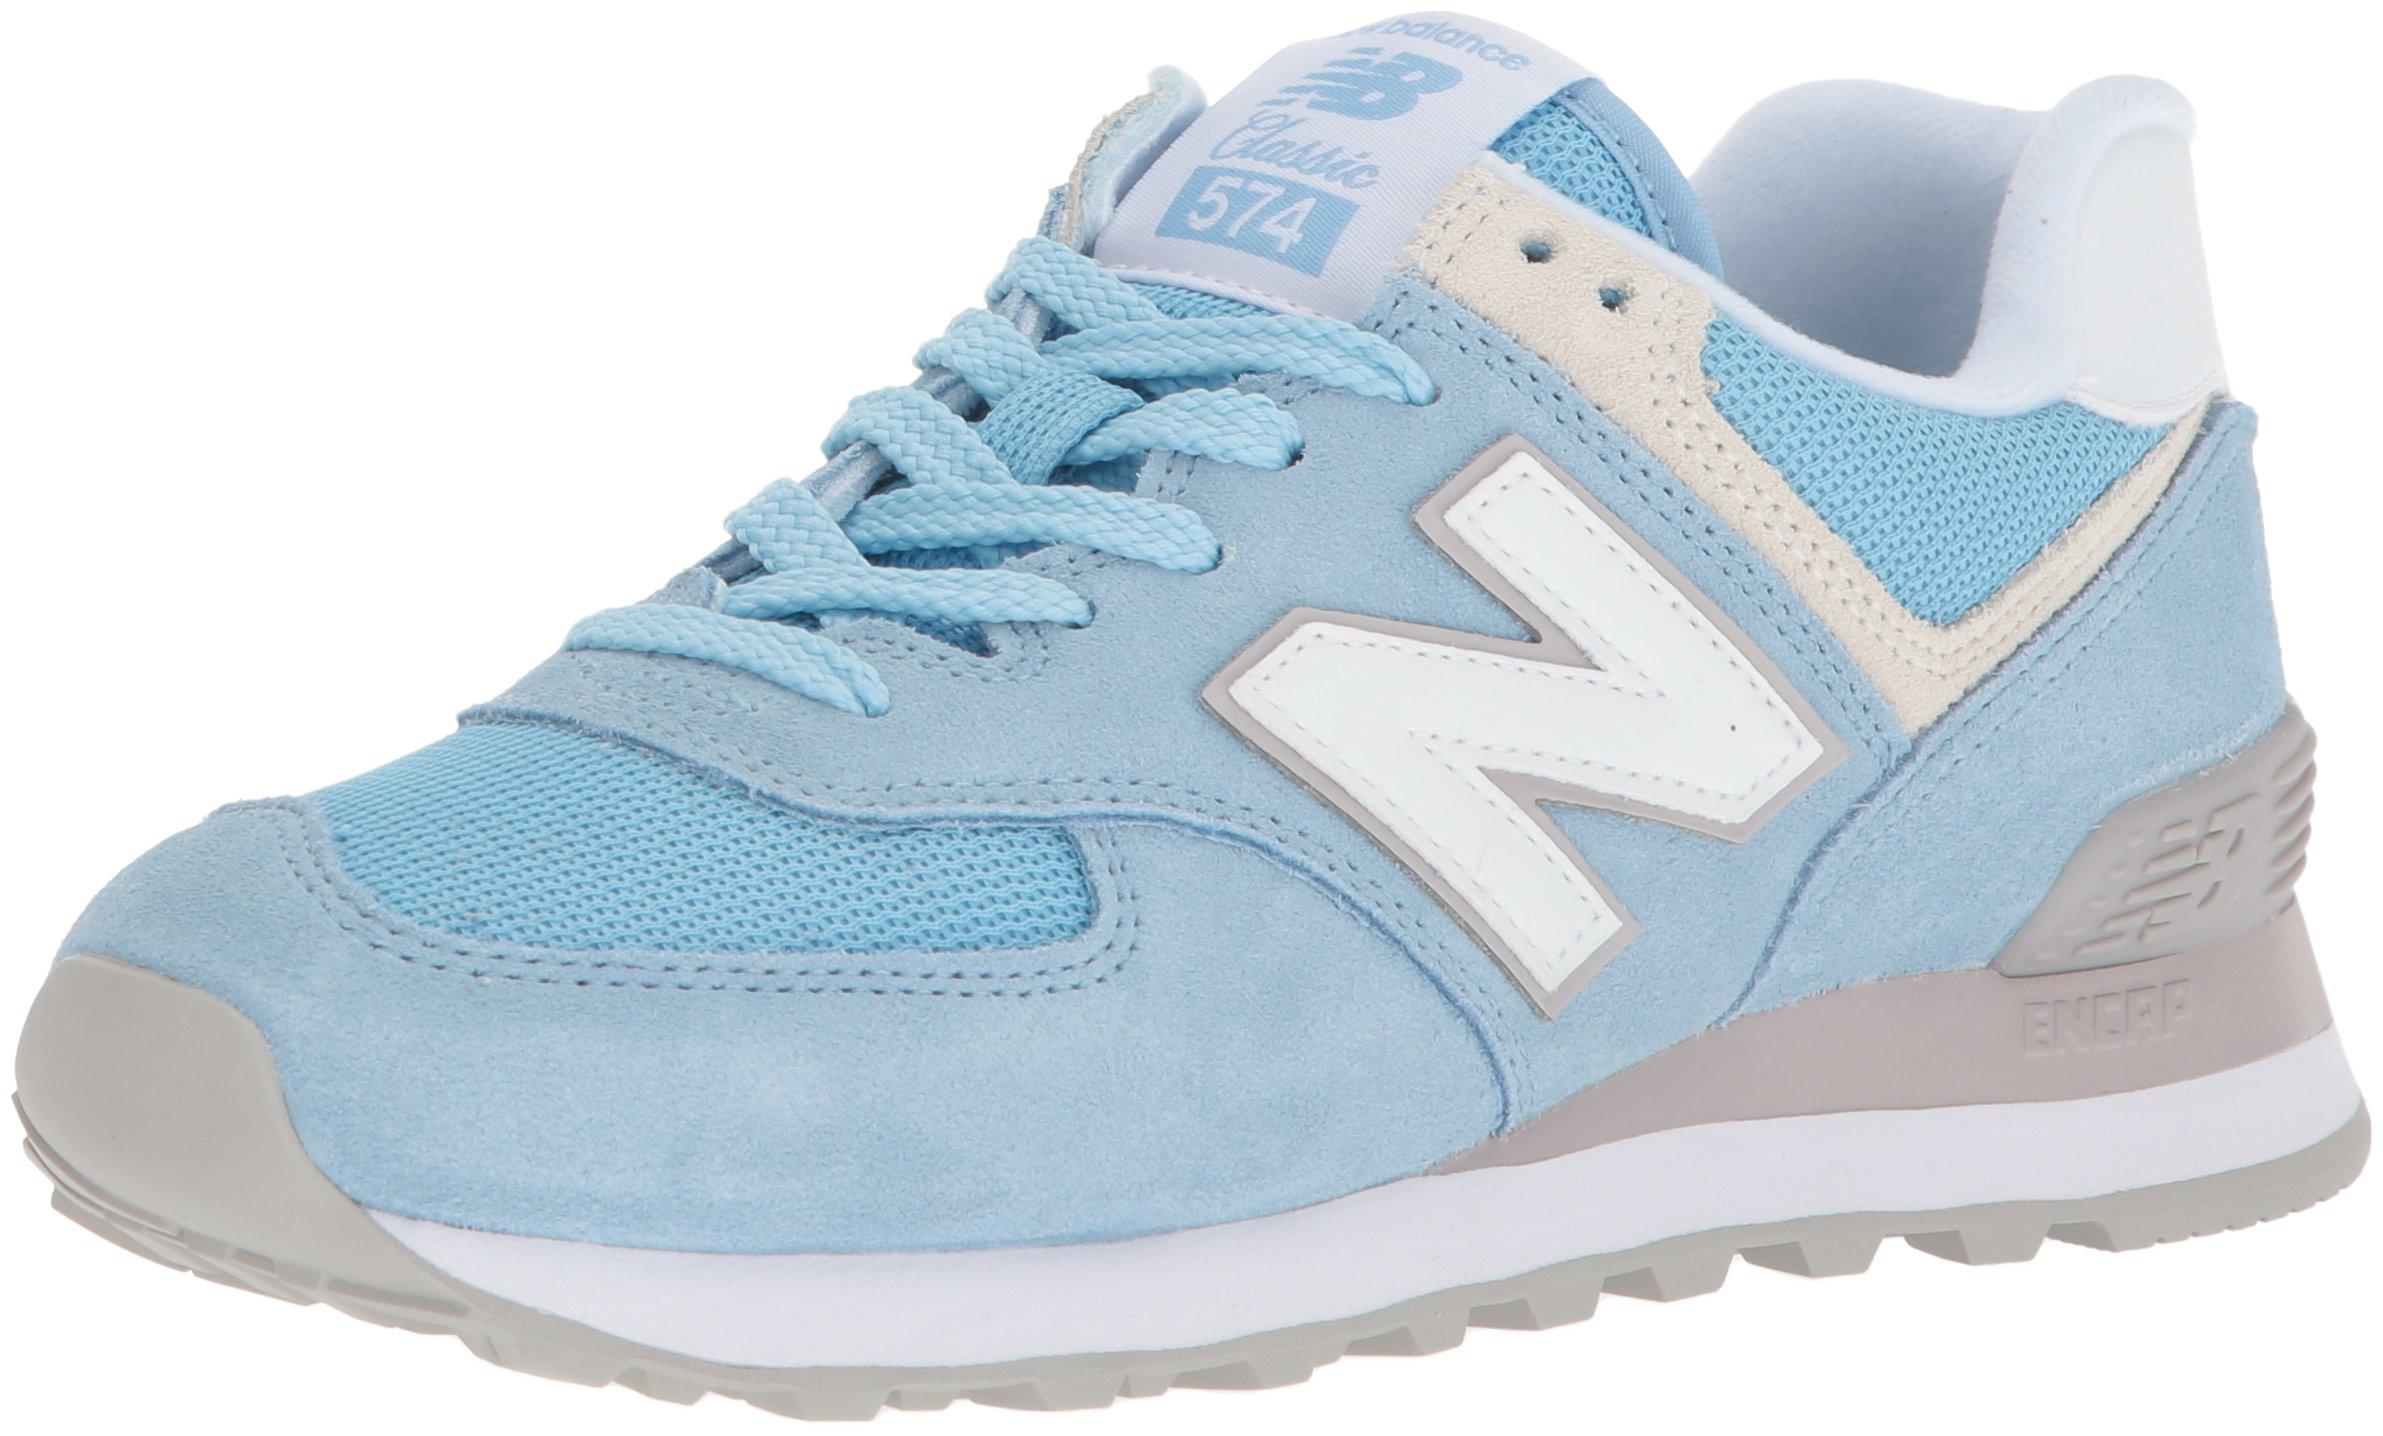 7dac67d446aac New Balance Womens 574v2 Sneaker | Amazon